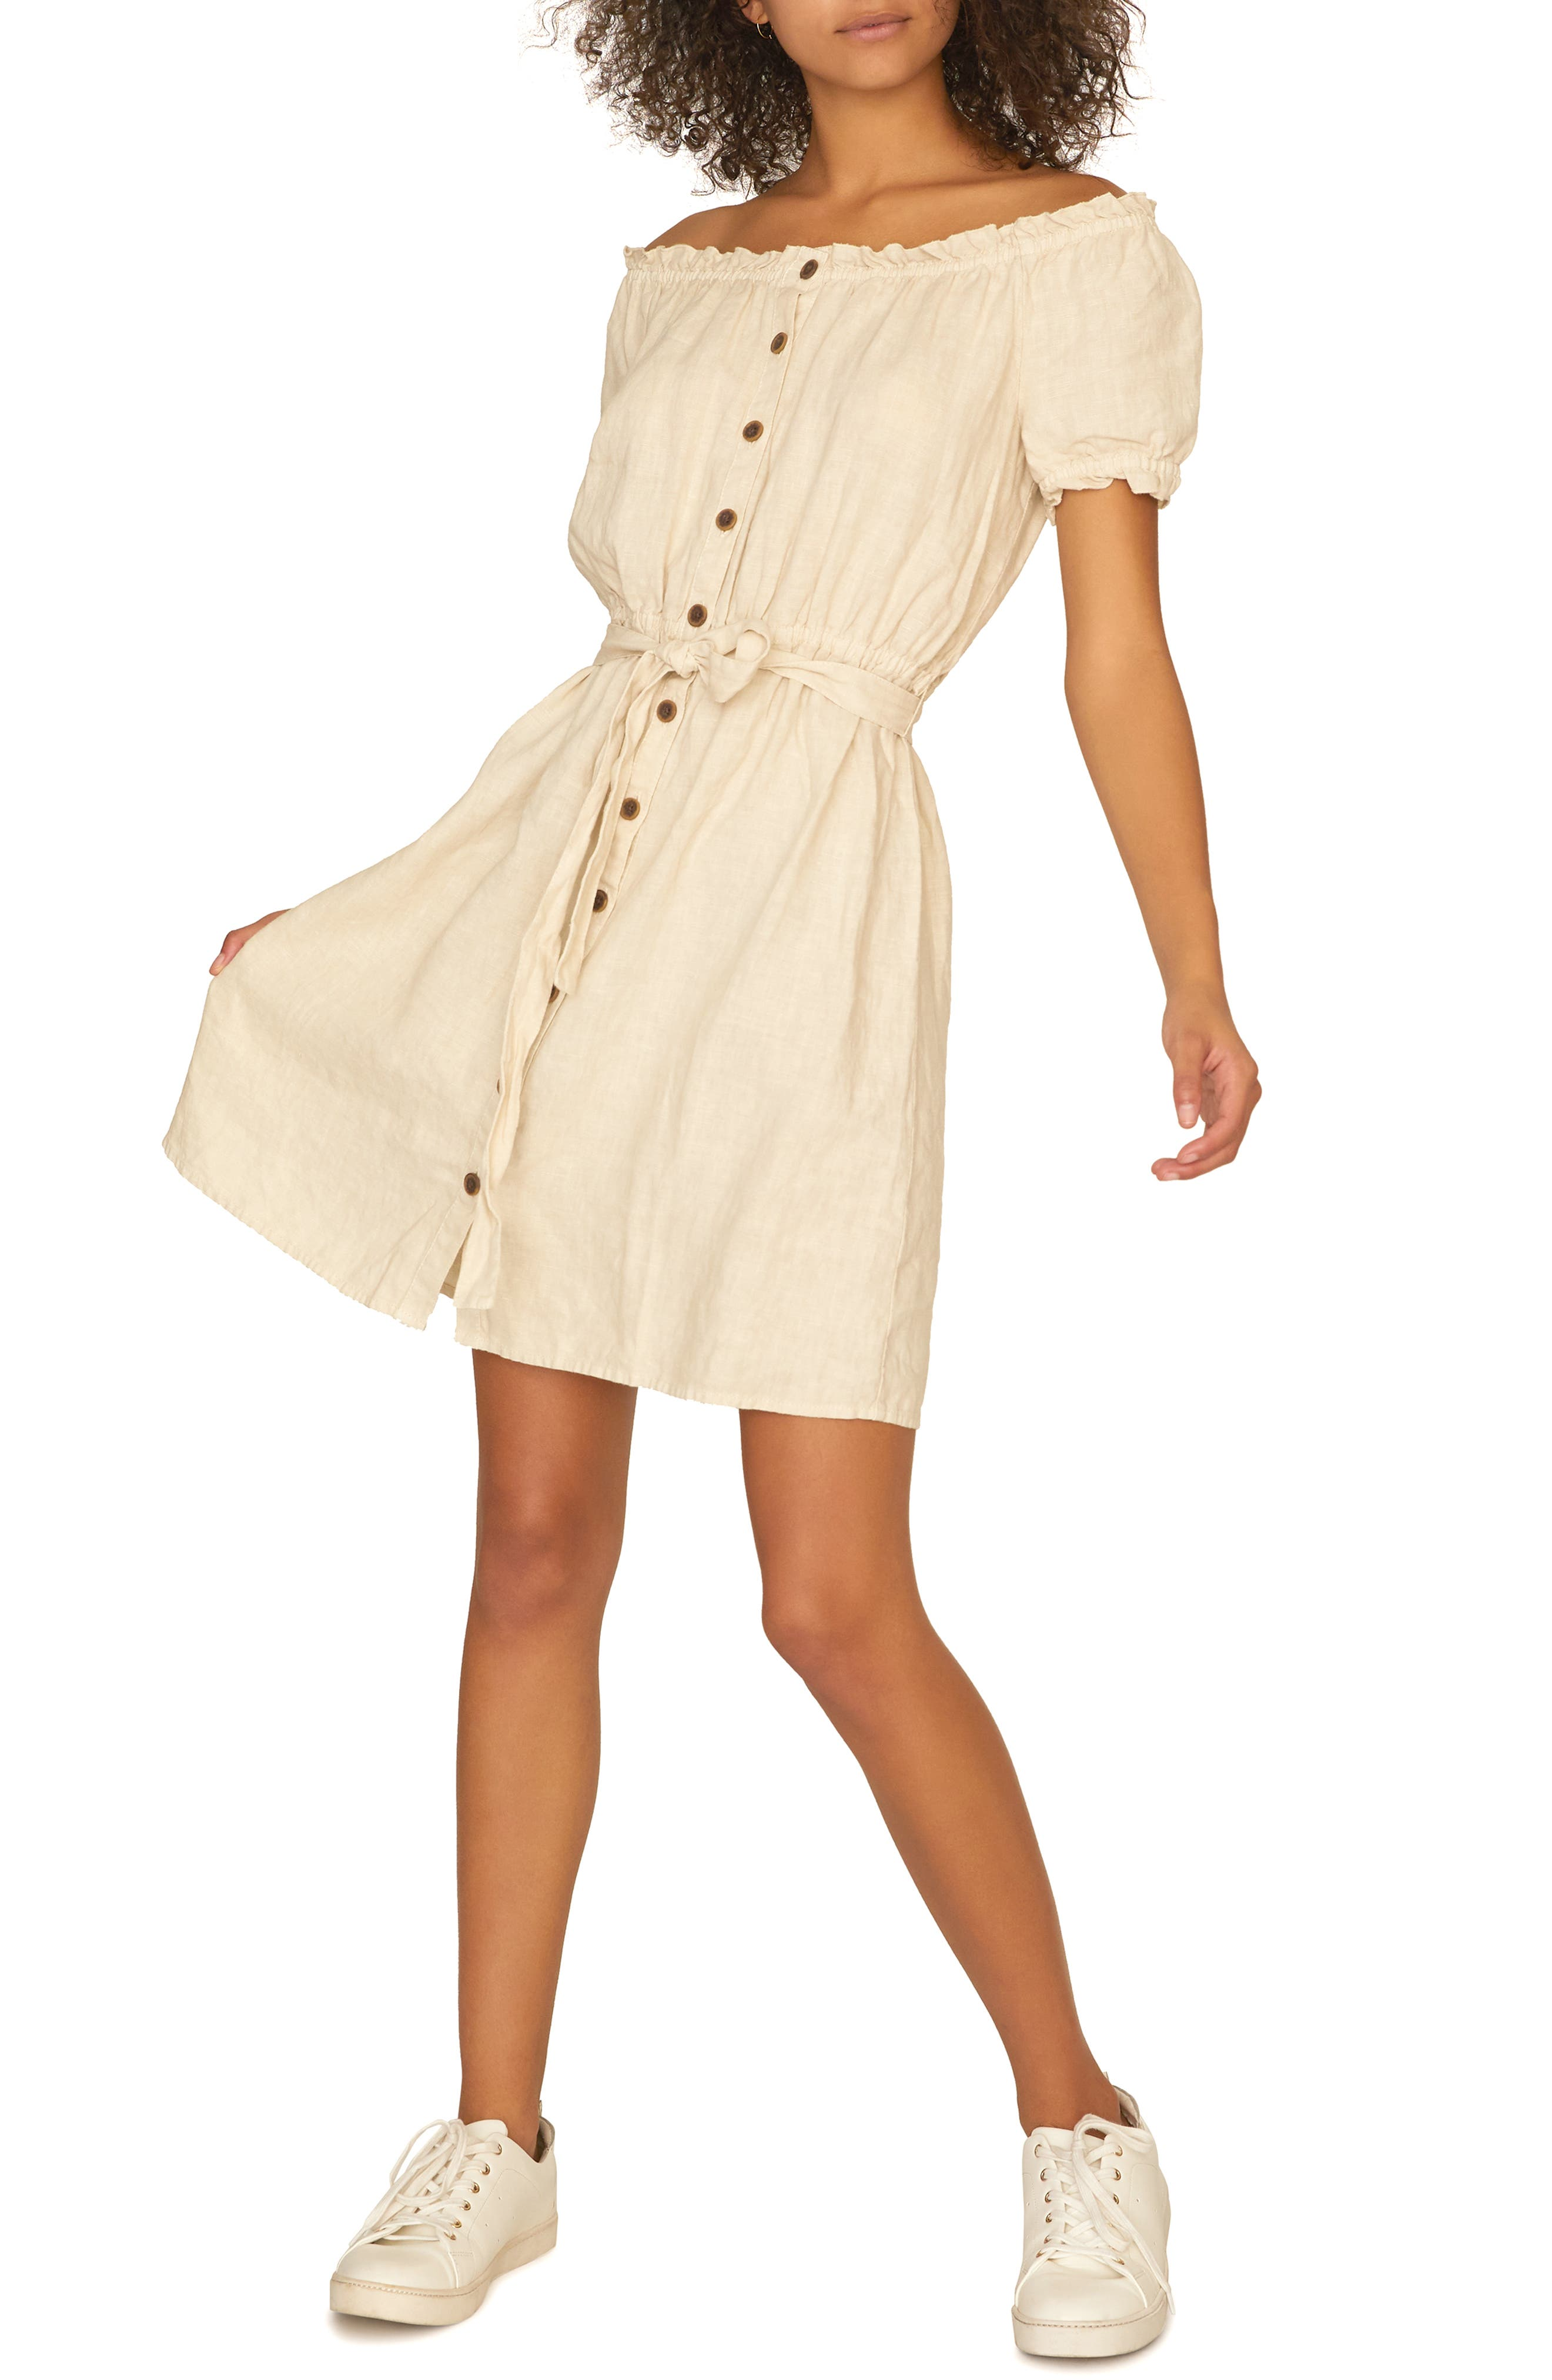 Sanctuary Washed Linen Off The Shoulder Peasant Dress, Ivory